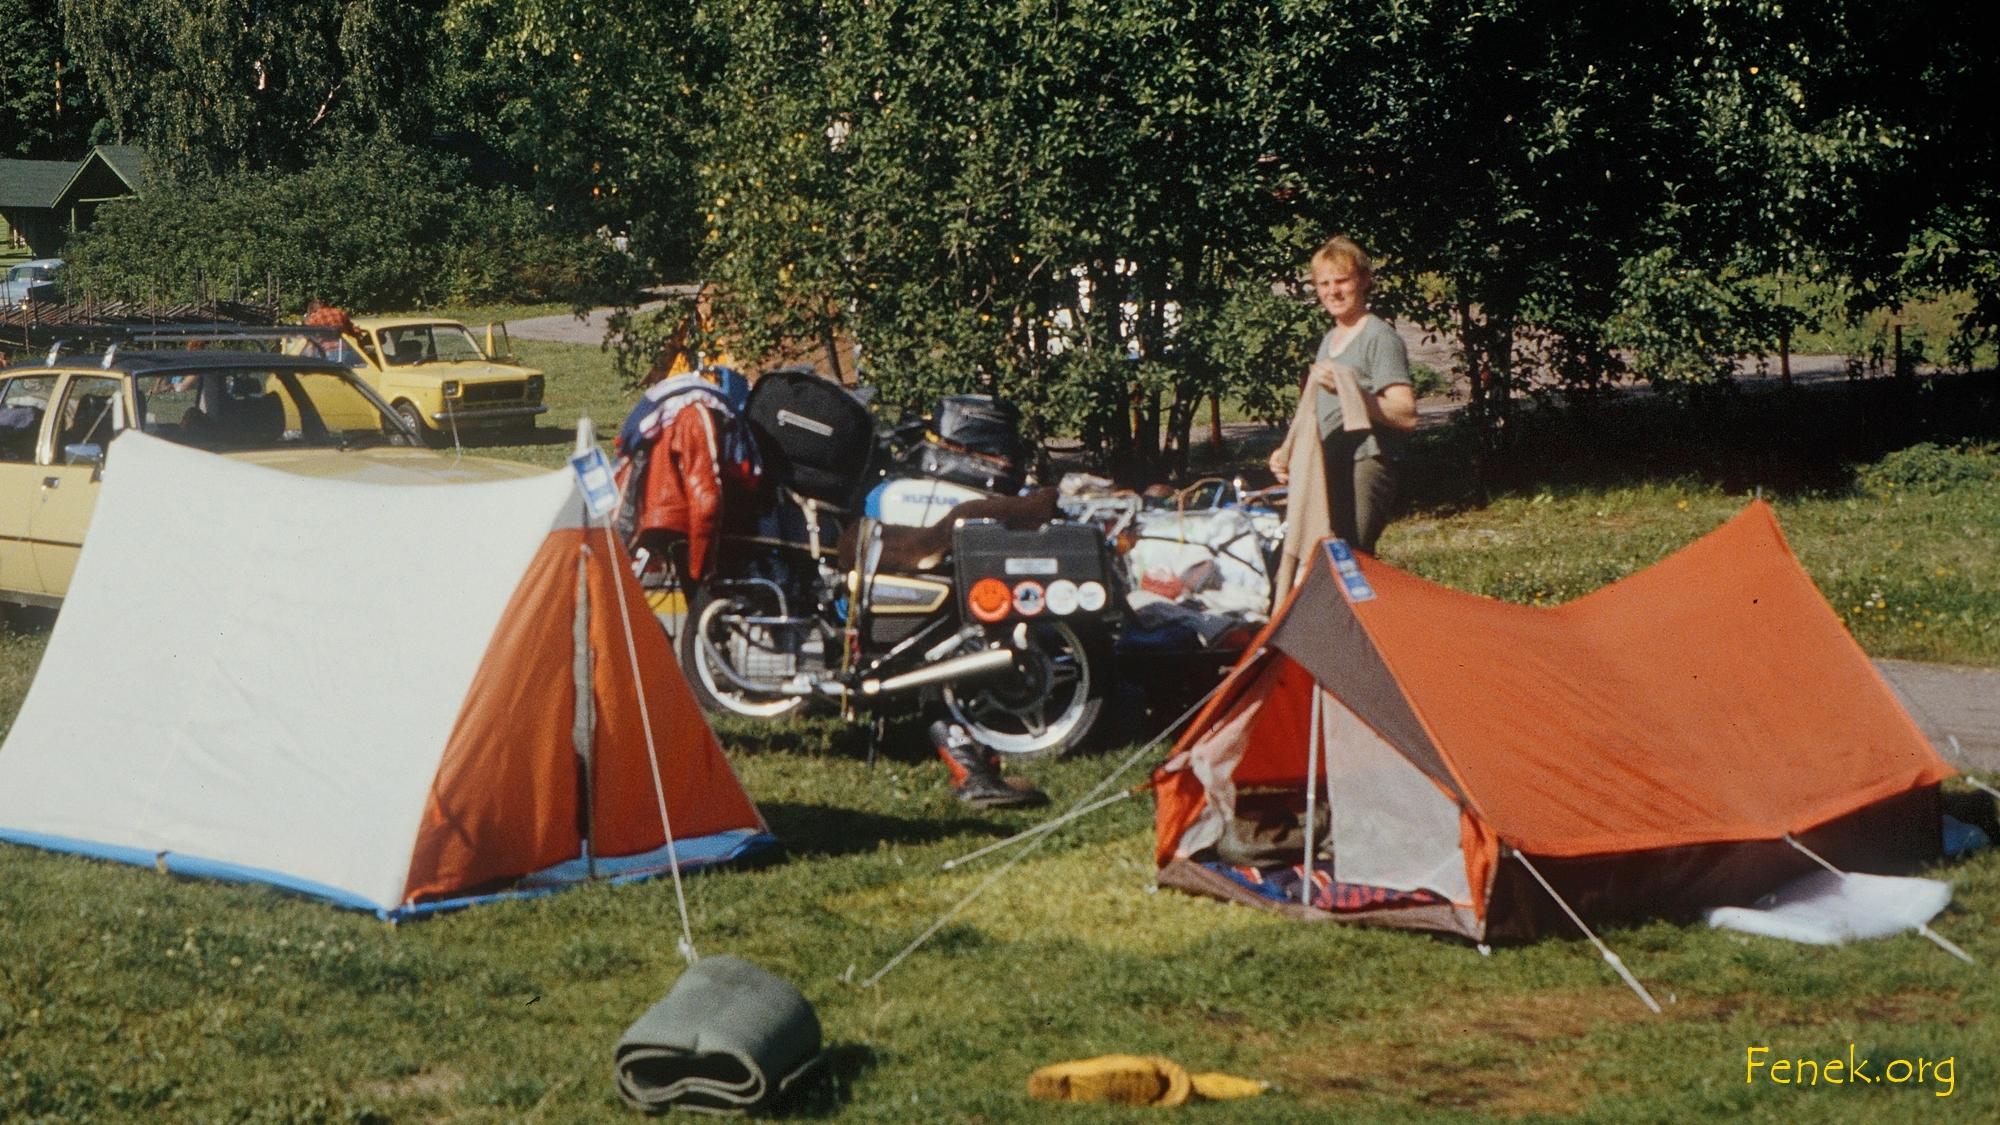 Campingplatz in Stockholm